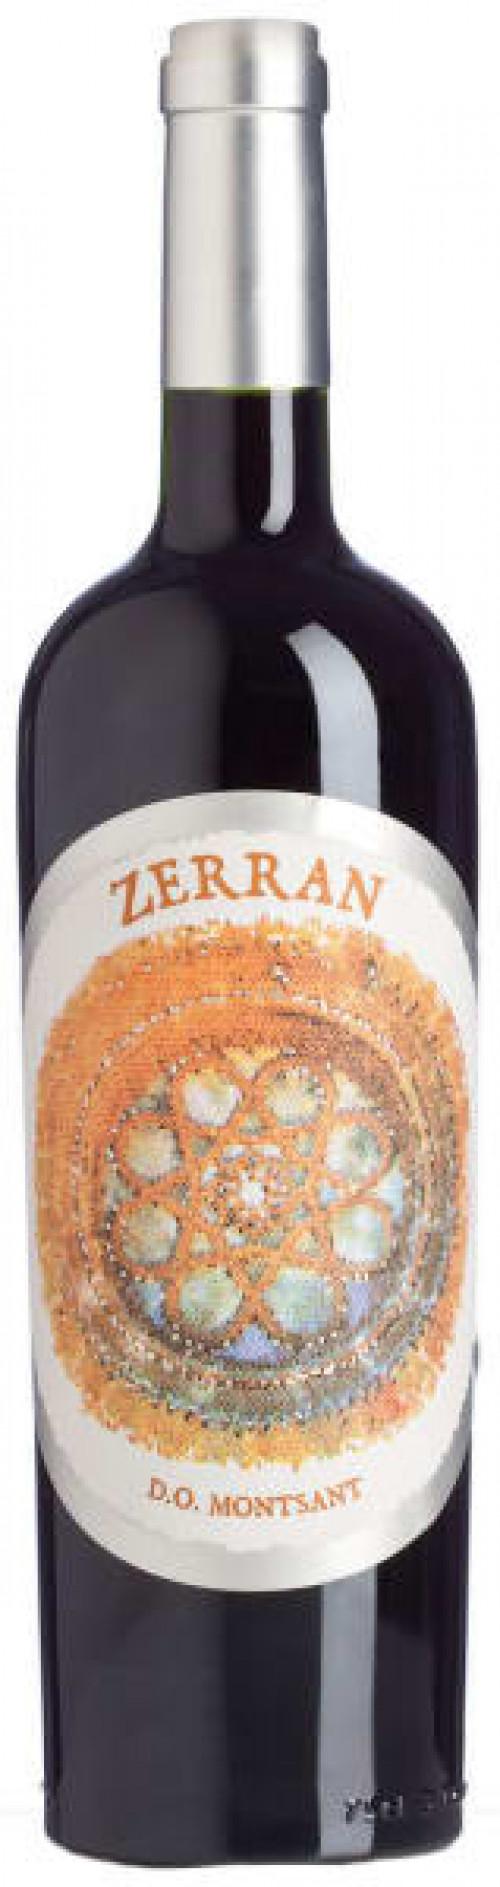 2014 Montsant Zerran Red 750ml